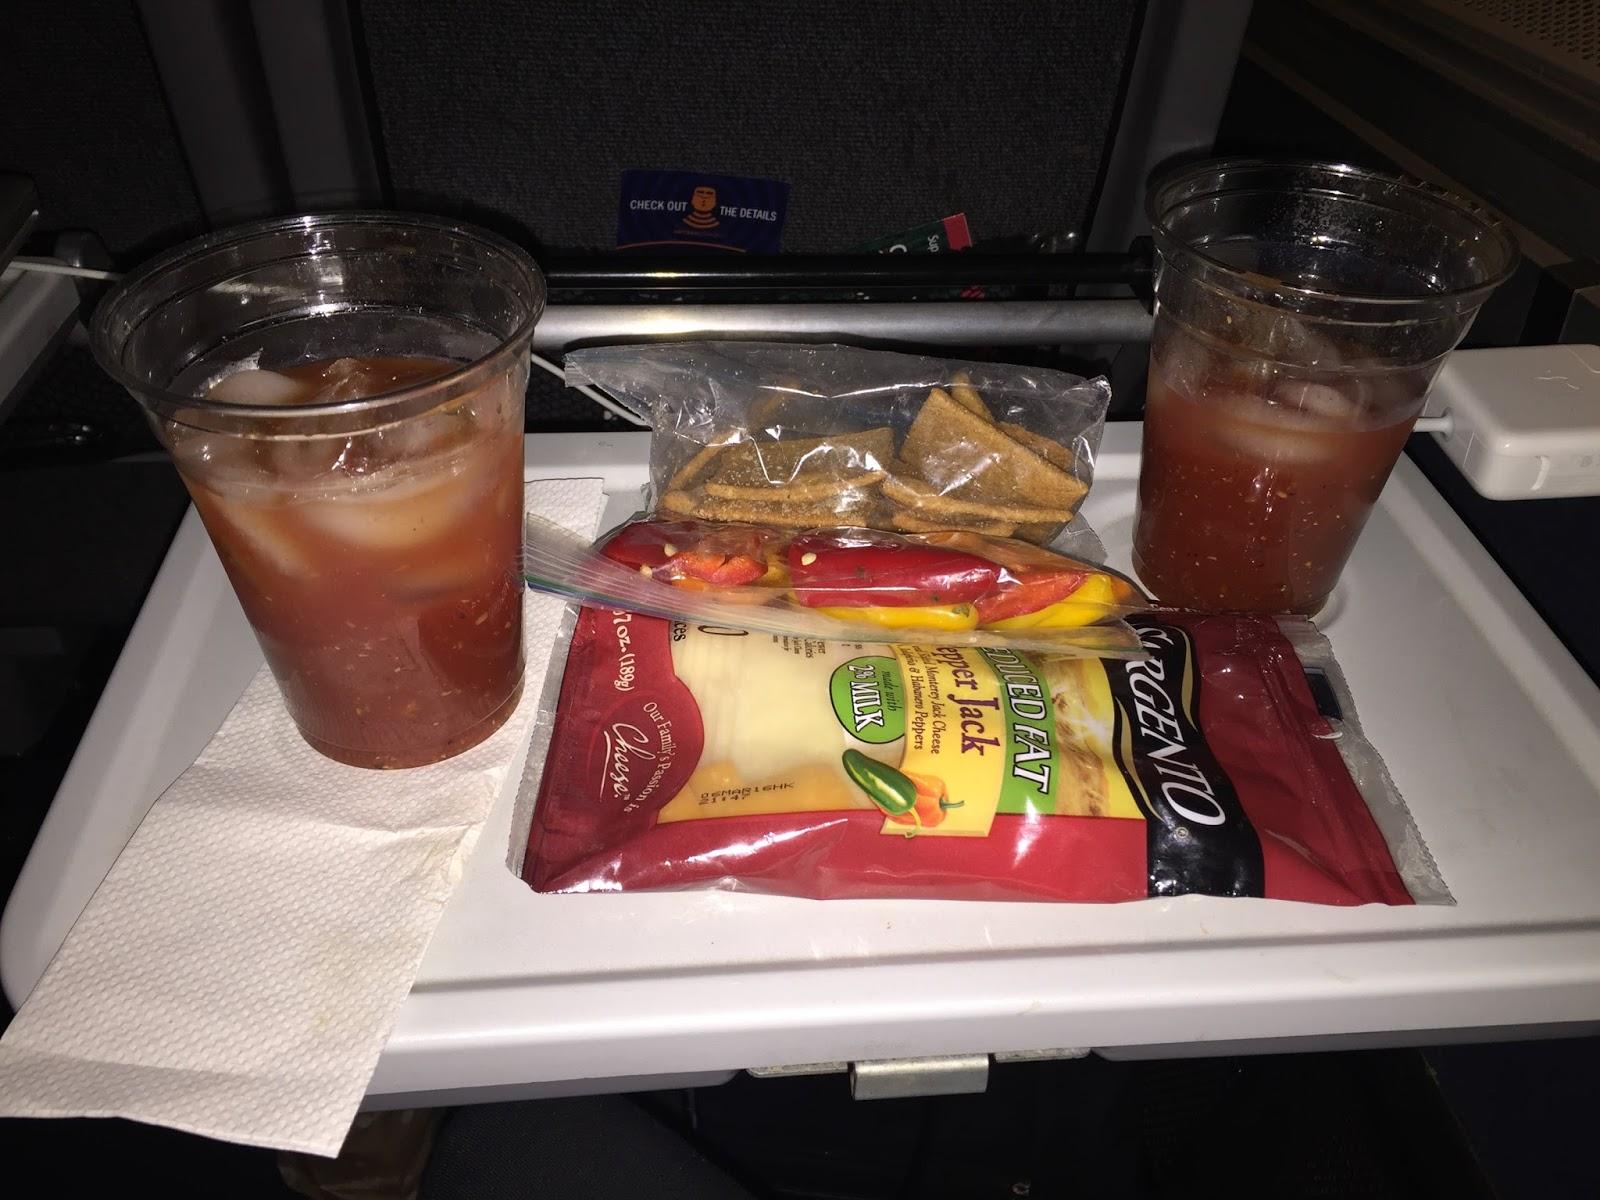 Amtrak Food Menu